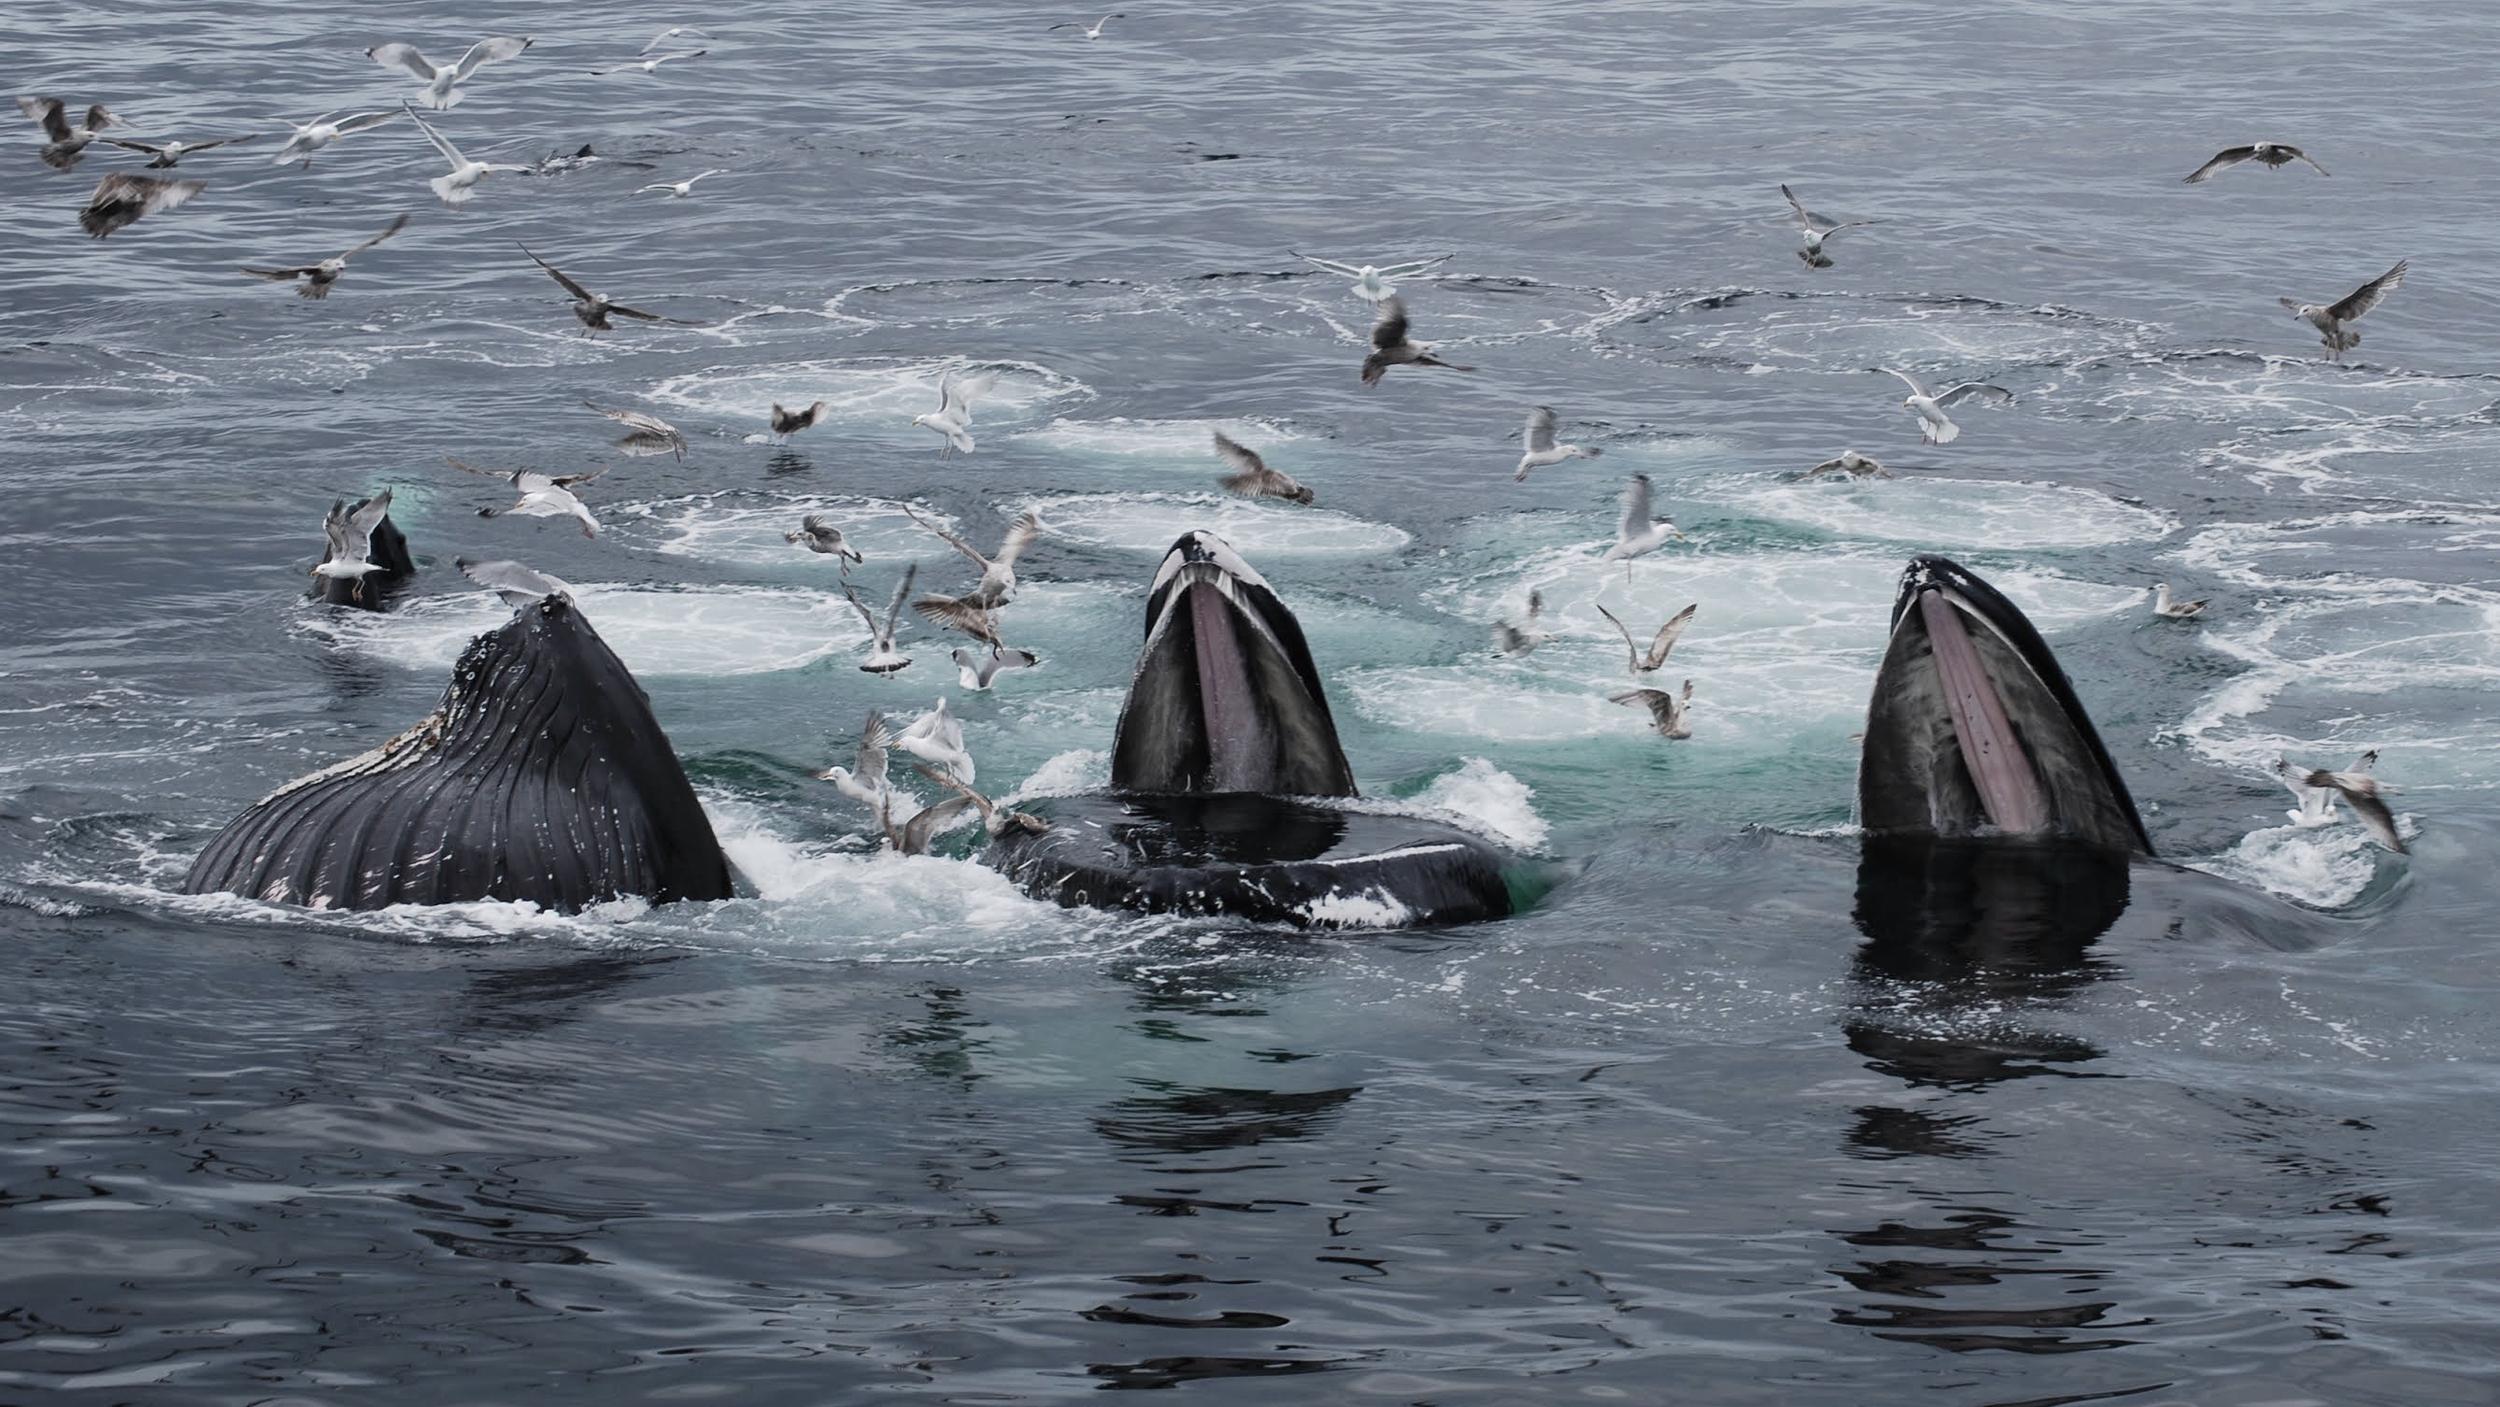 Humpbacks co-operatively feeding, Cape Cod: Photo by Philip Hoare